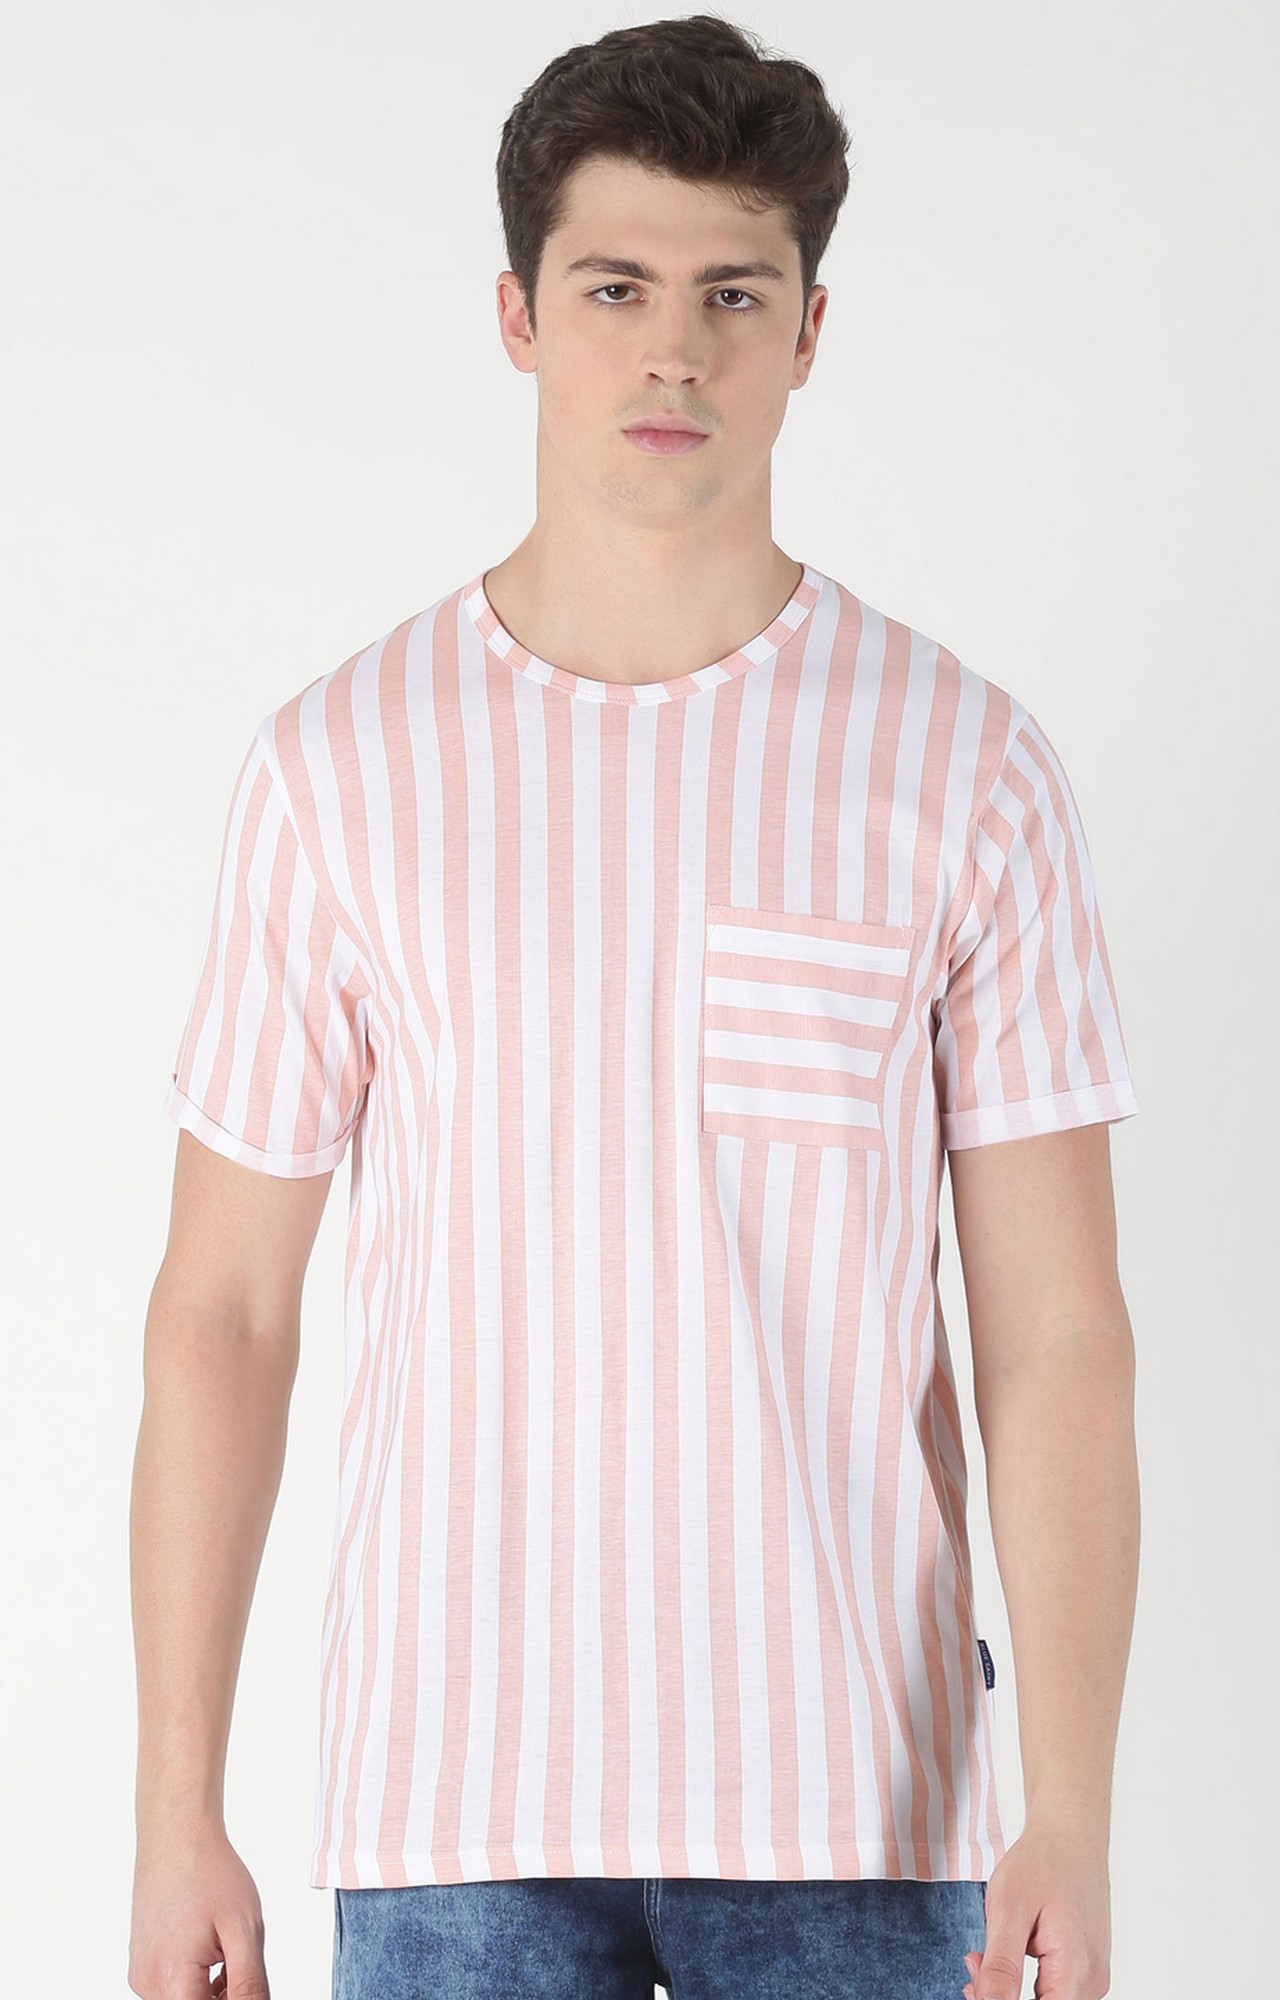 Blue Saint | Pink Striped T-Shirt